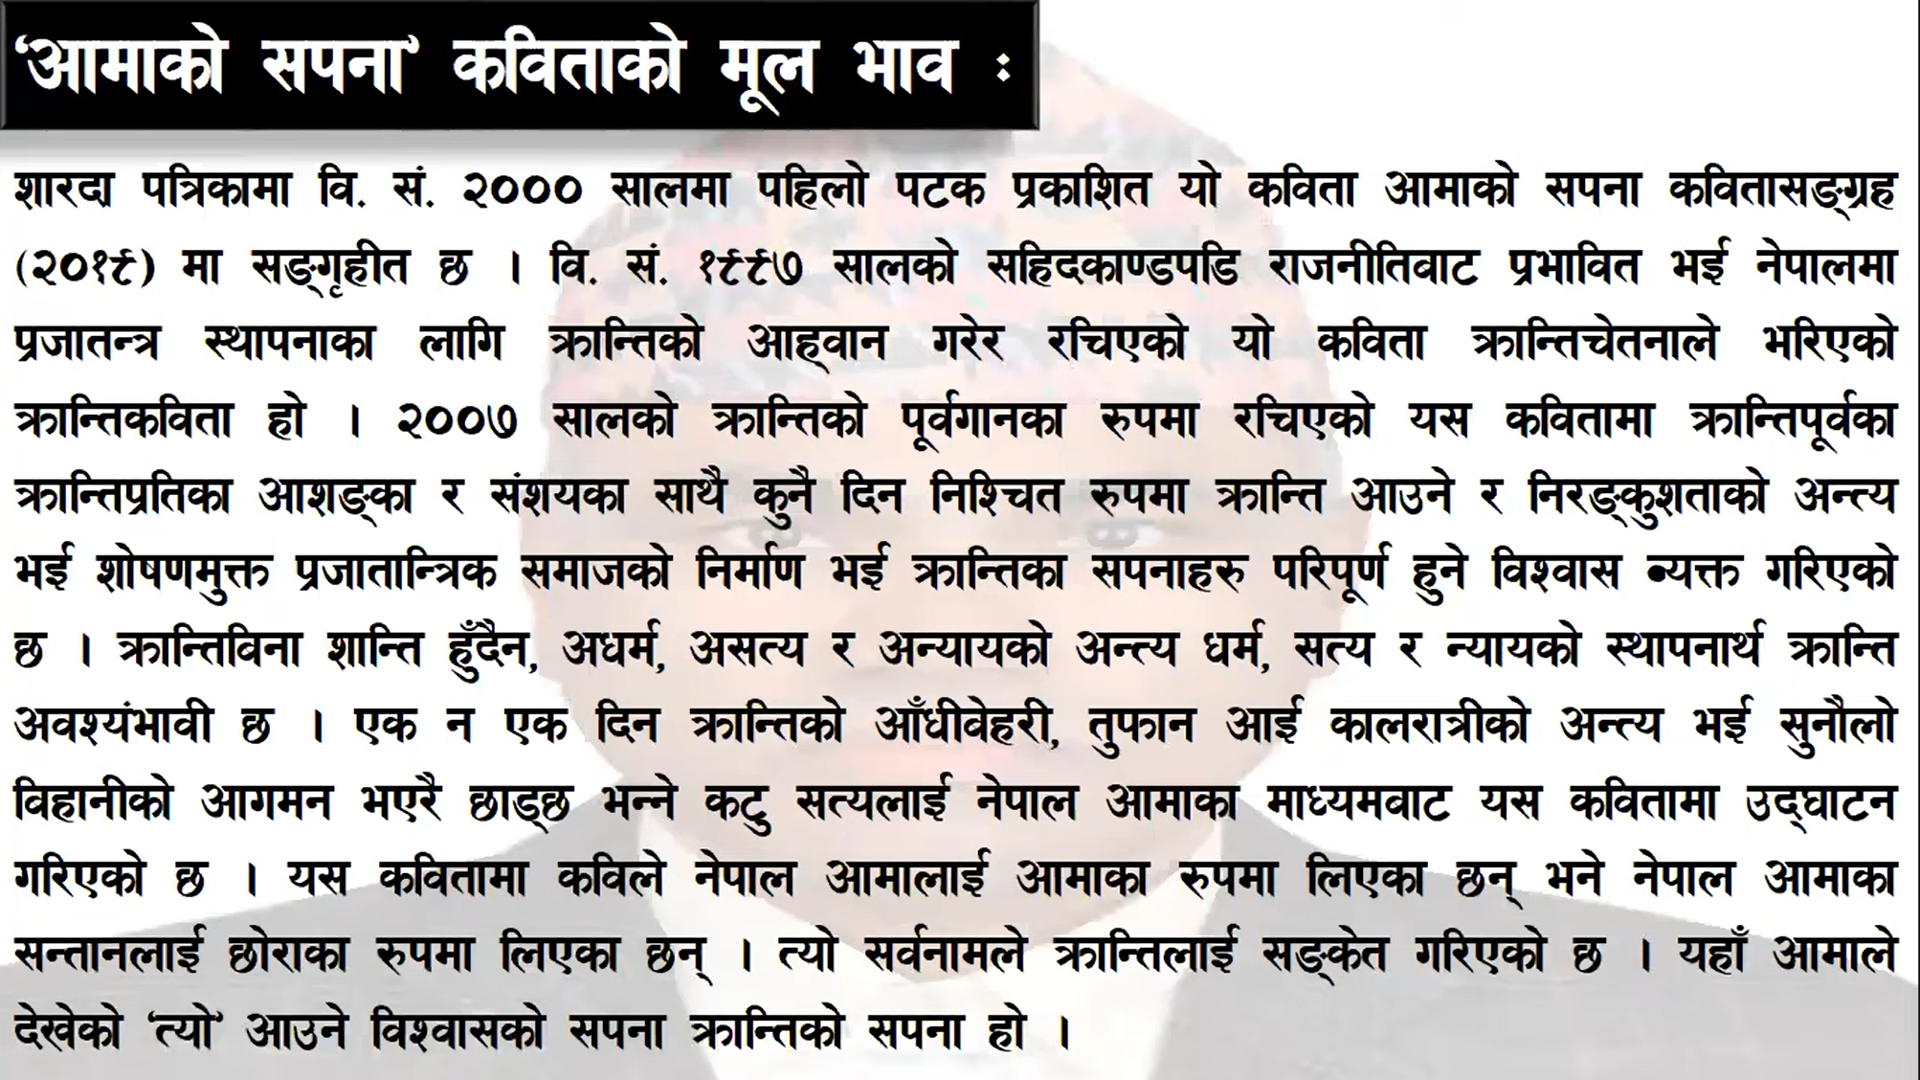 Aaama ko sapana poem summary in Nepali